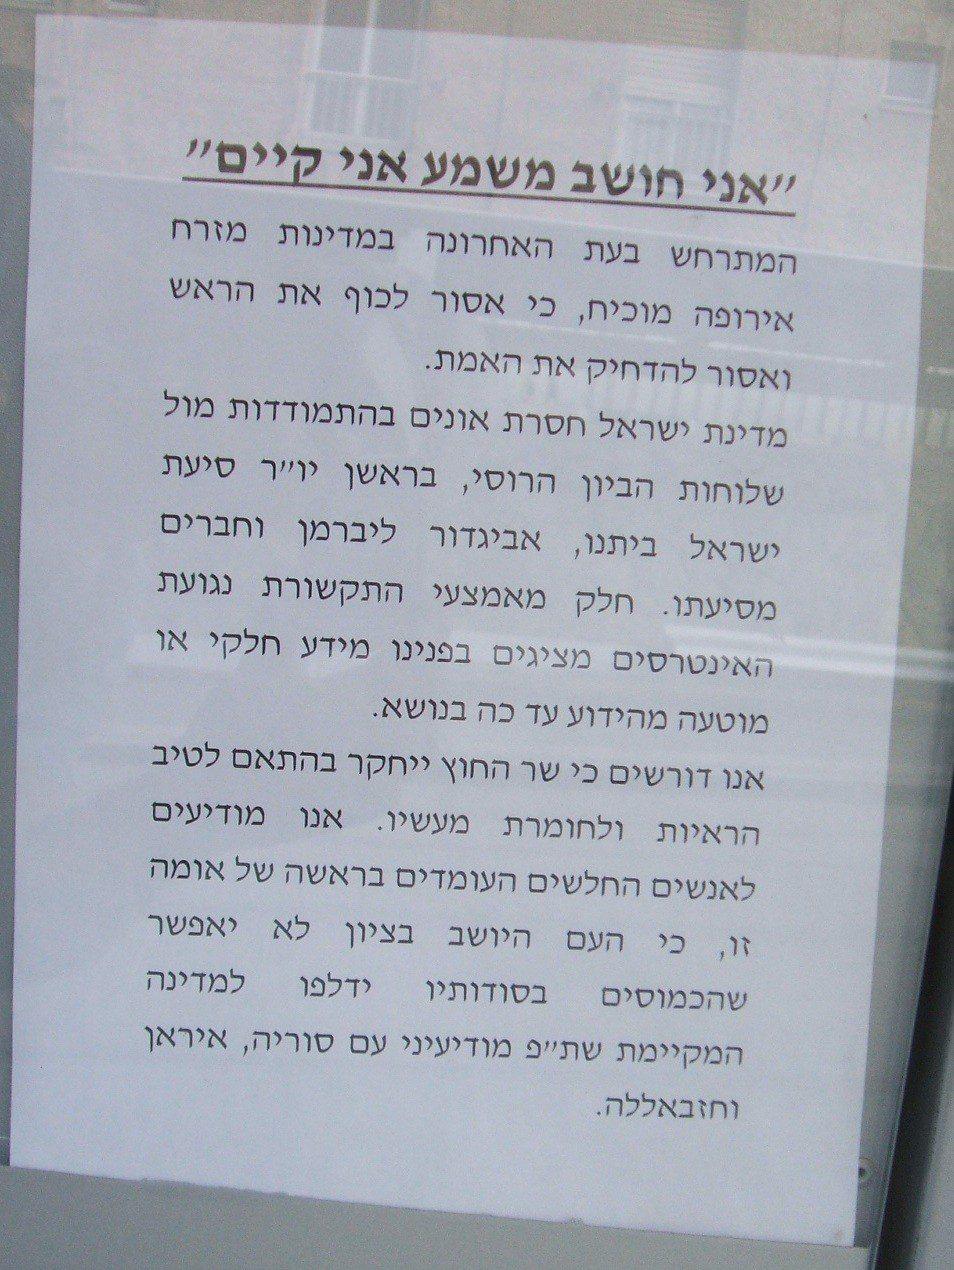 Shin Bet Withheld Iran Secrets from Lieberman as Security Risk - Tikun Olam תיקון עולם